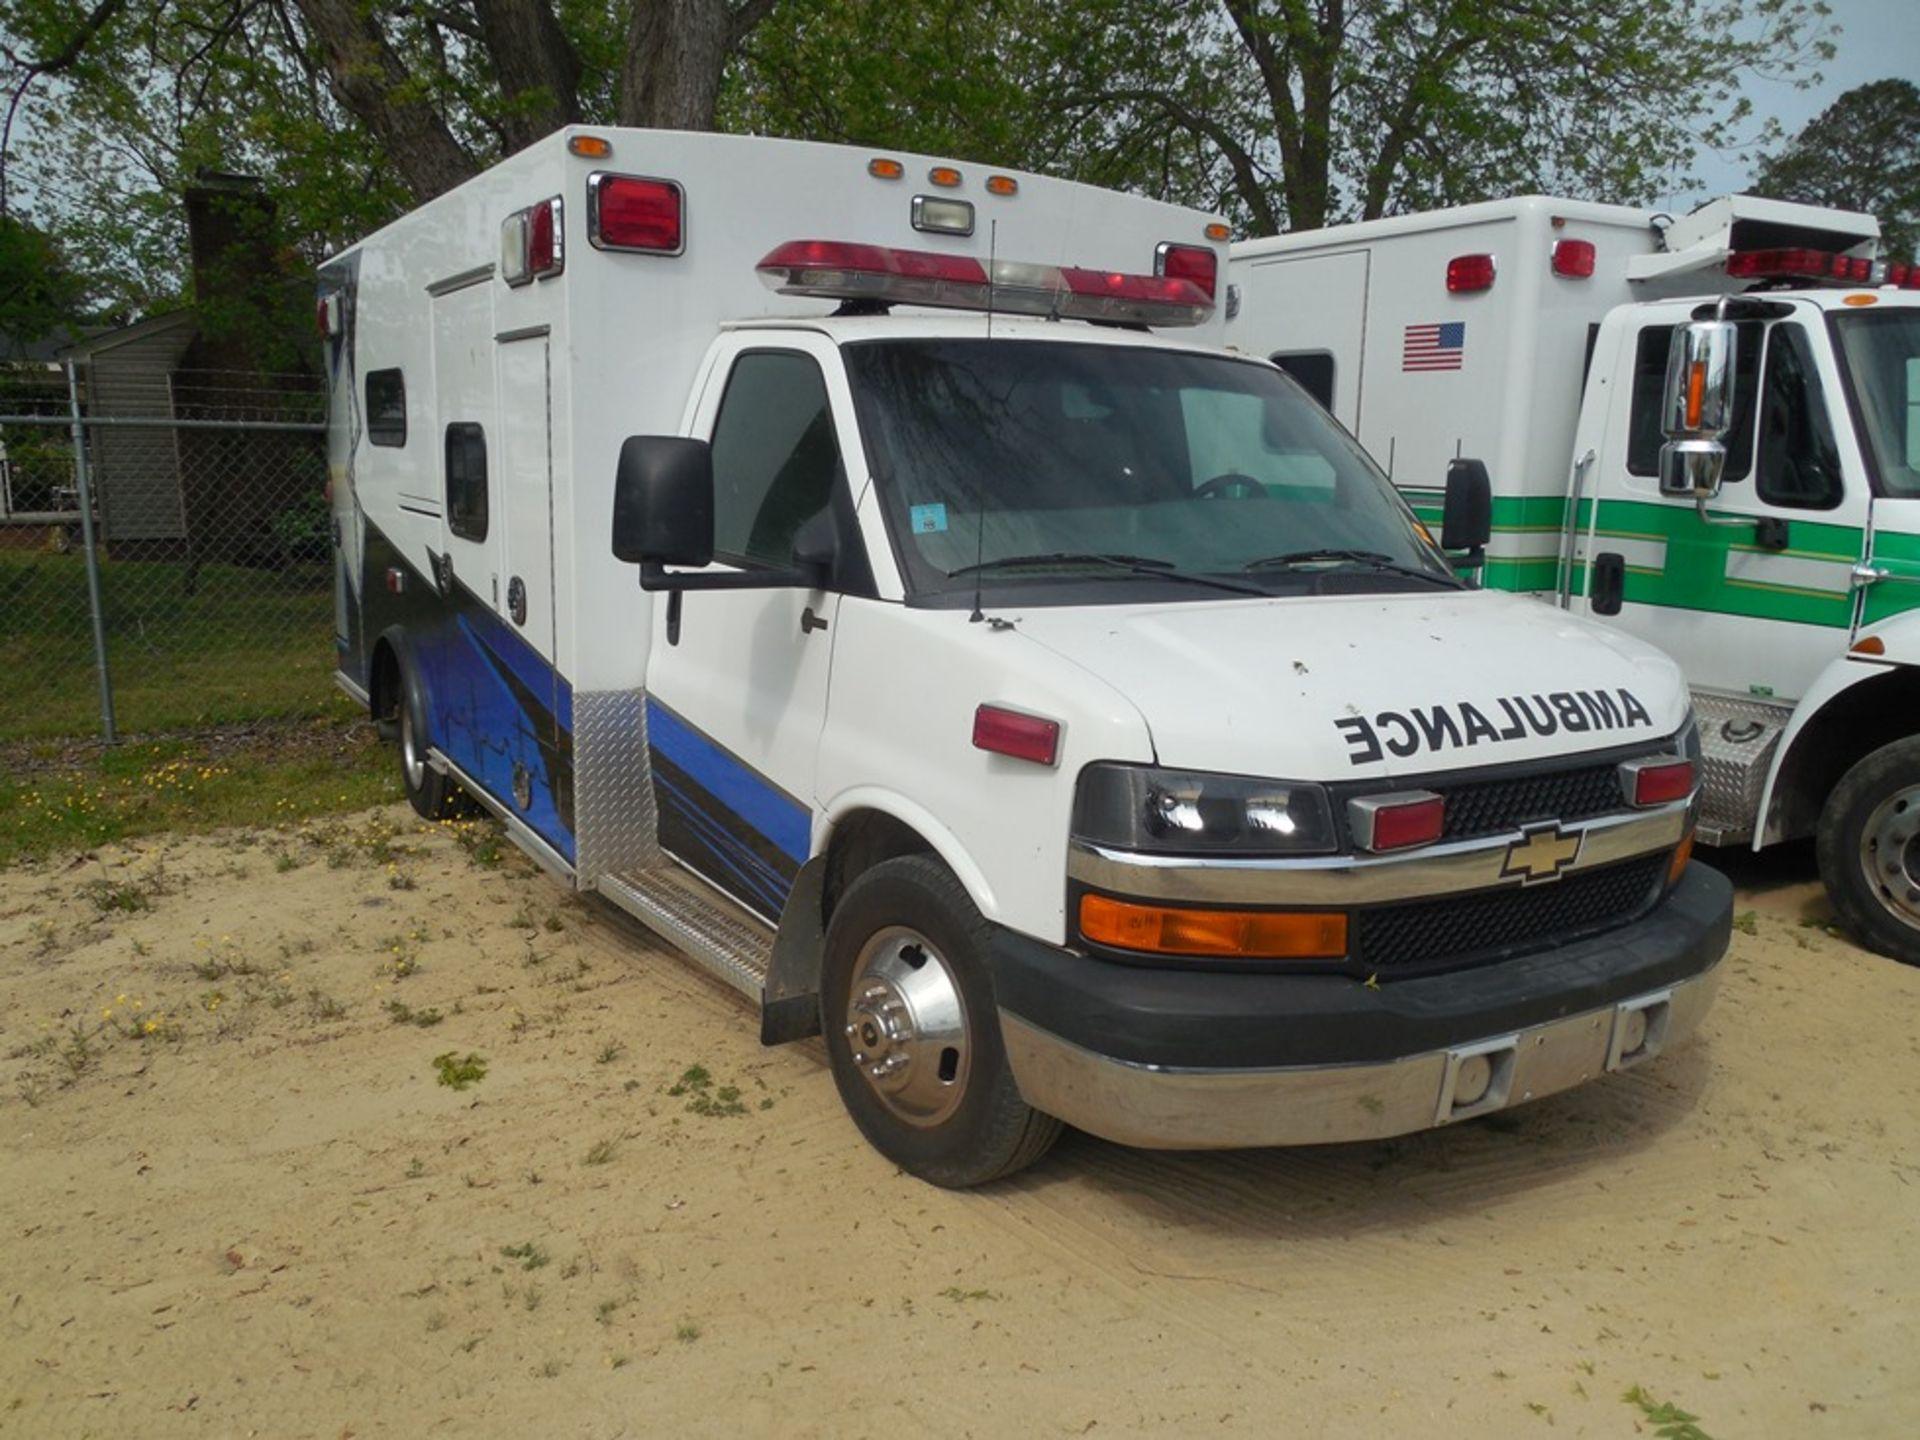 2011 Chev dsl. box ambulance Baun Body 202,680 miles vin# 1GB6G5CL5B1141656 - Image 3 of 6